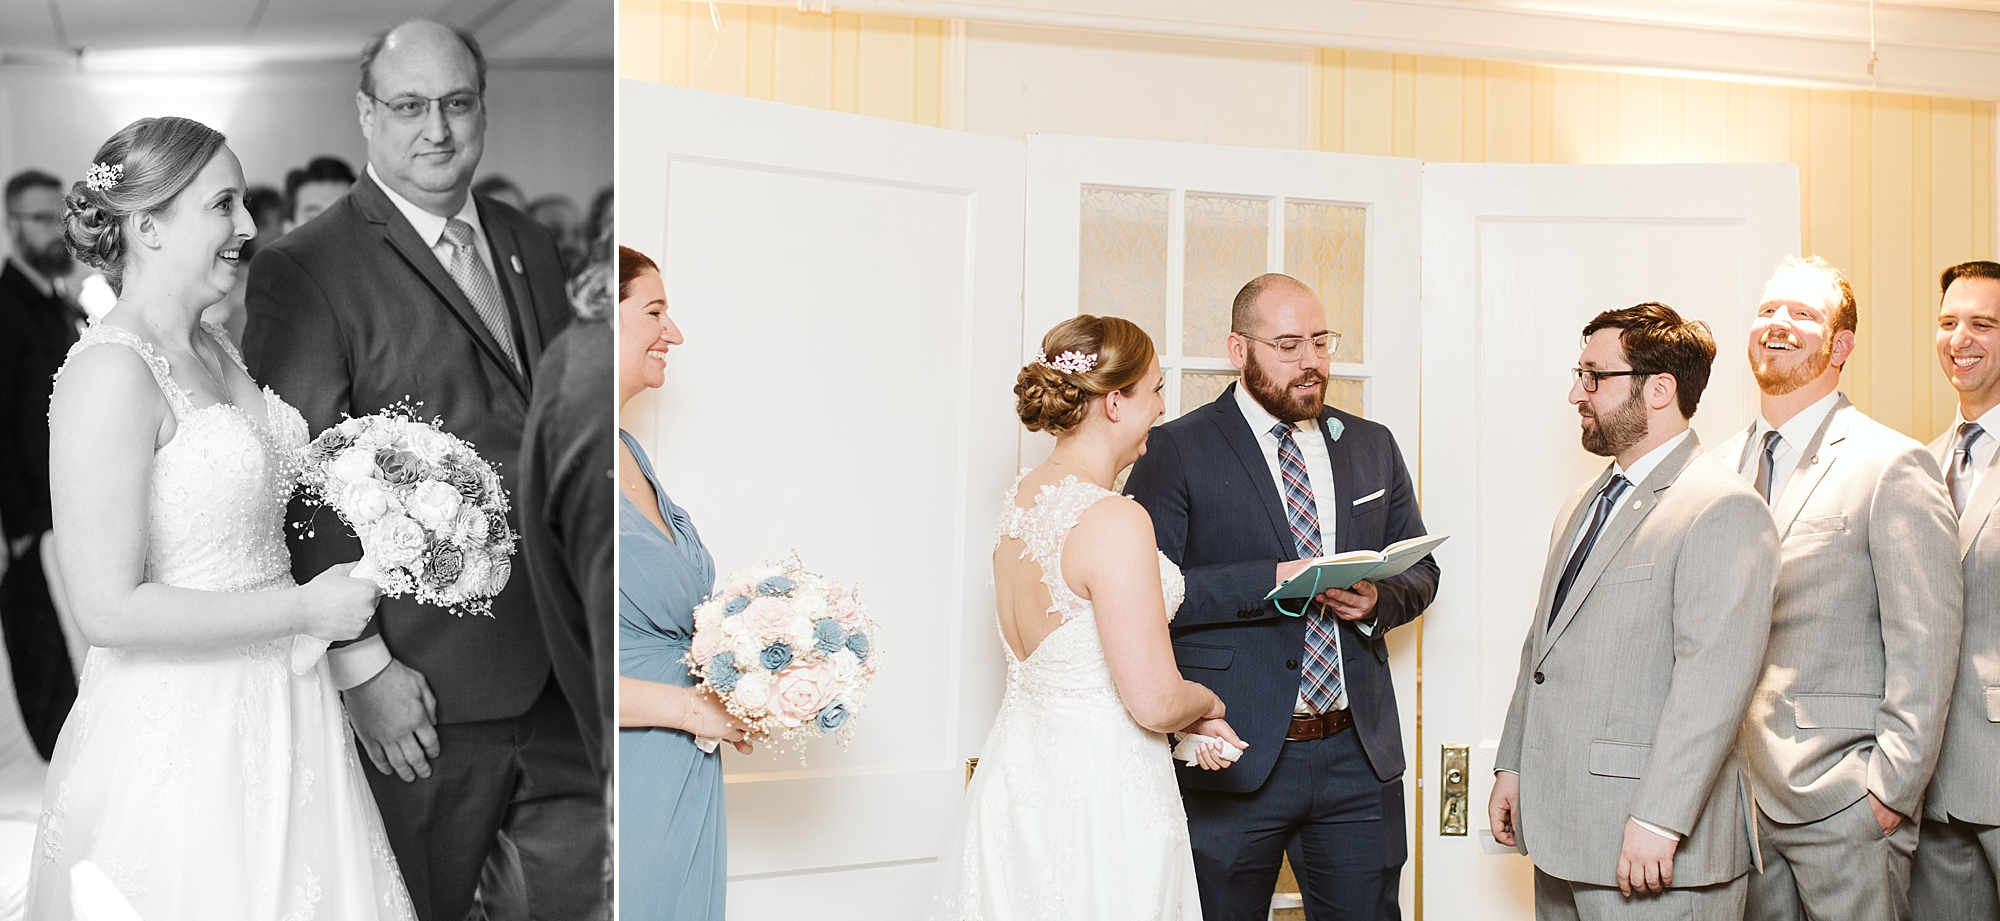 eisleyimages-concordcolonialinn-wedding_0062.jpg